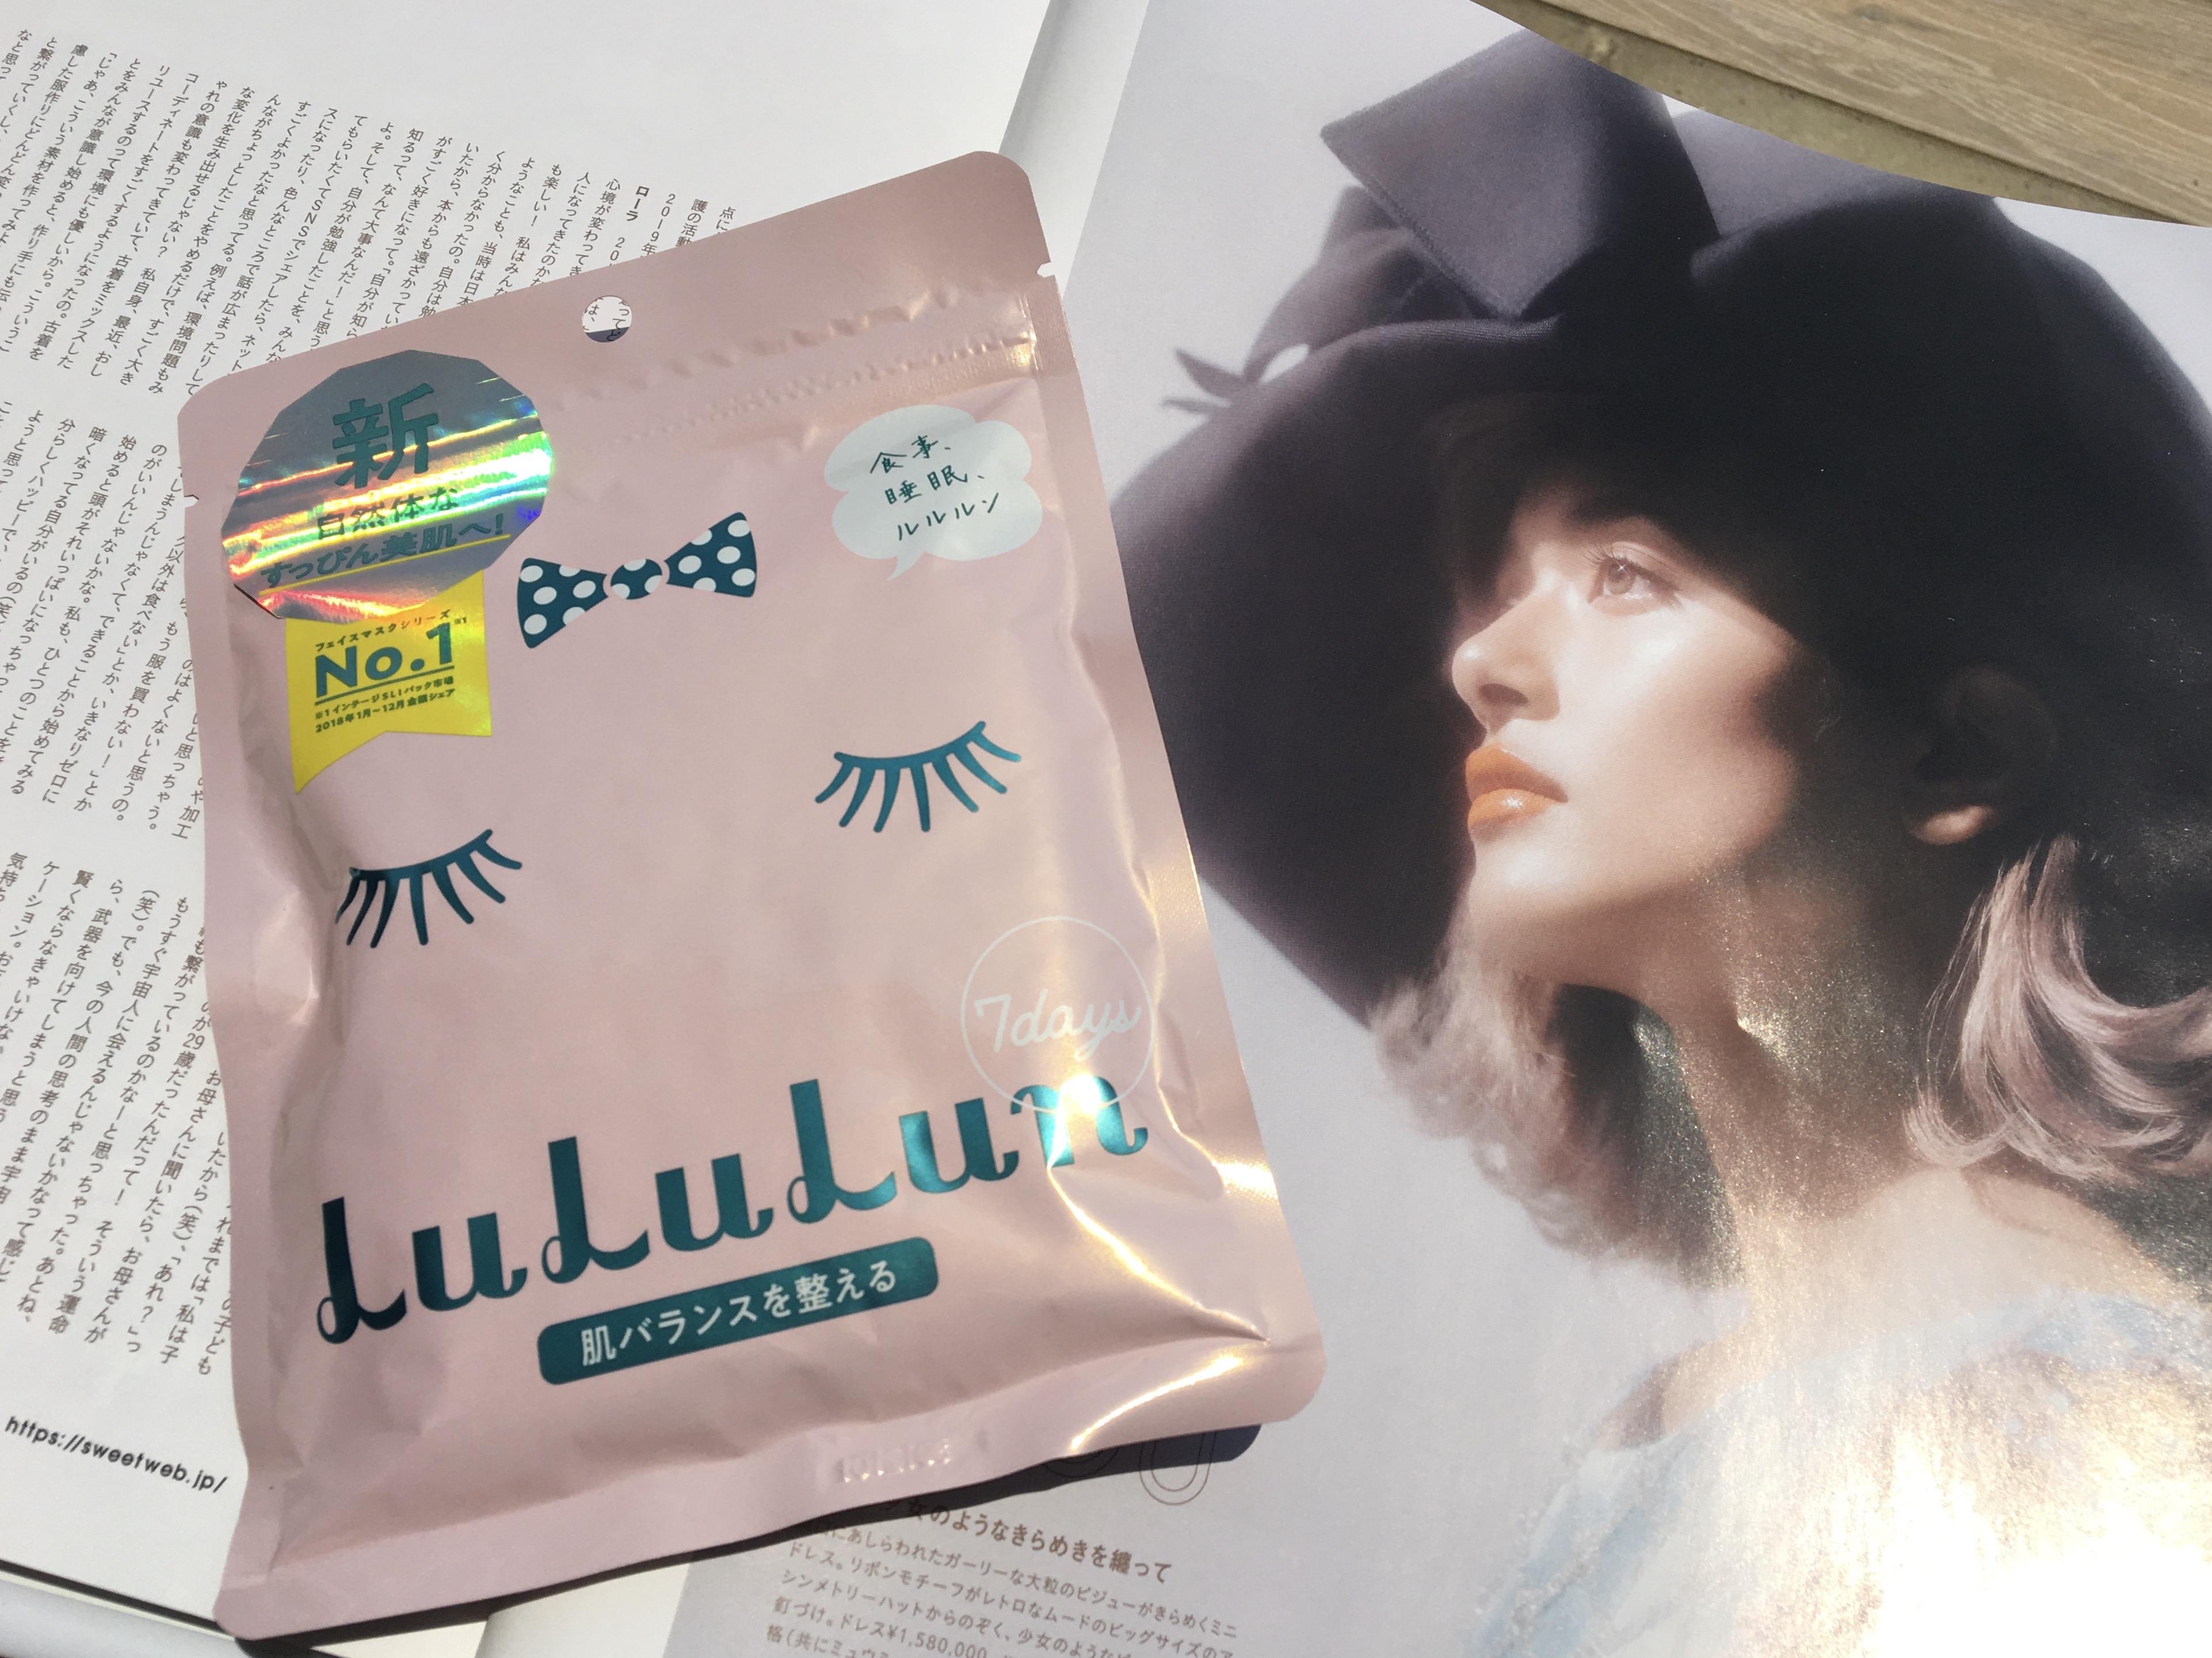 REVIEW | Lululun Face Mask #Pink Moisturizing